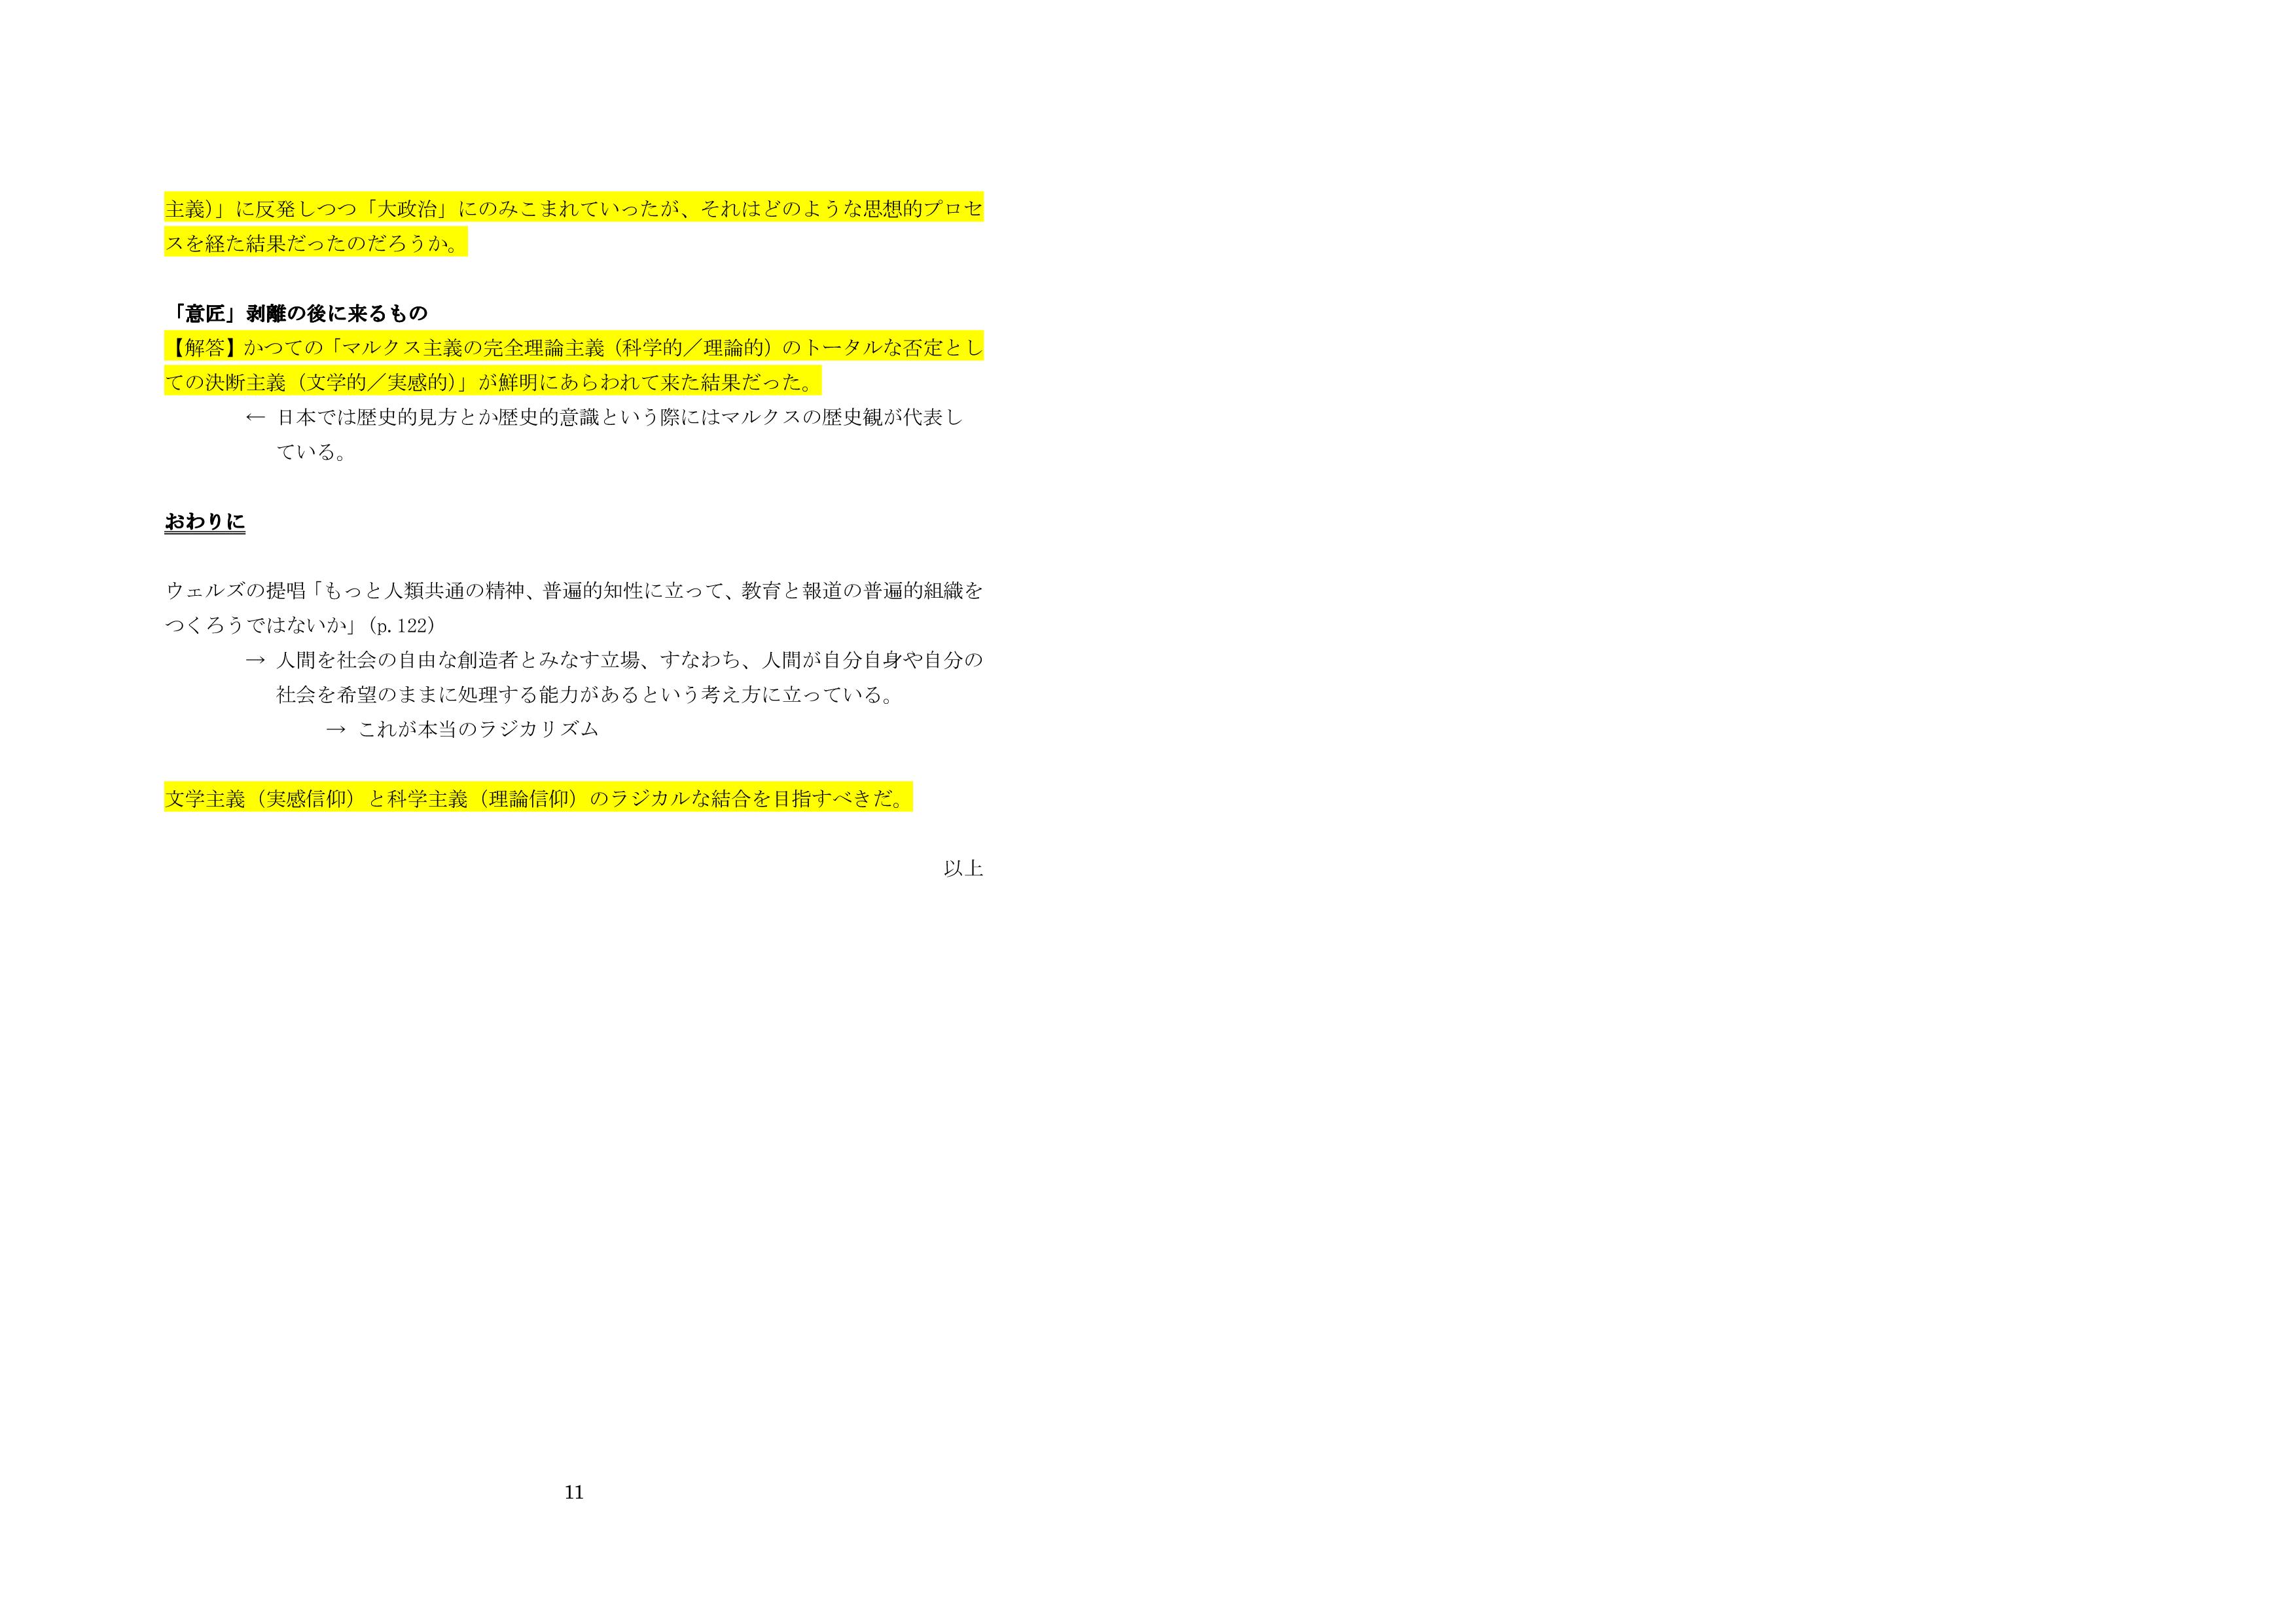 日本の思想(第二章)-006